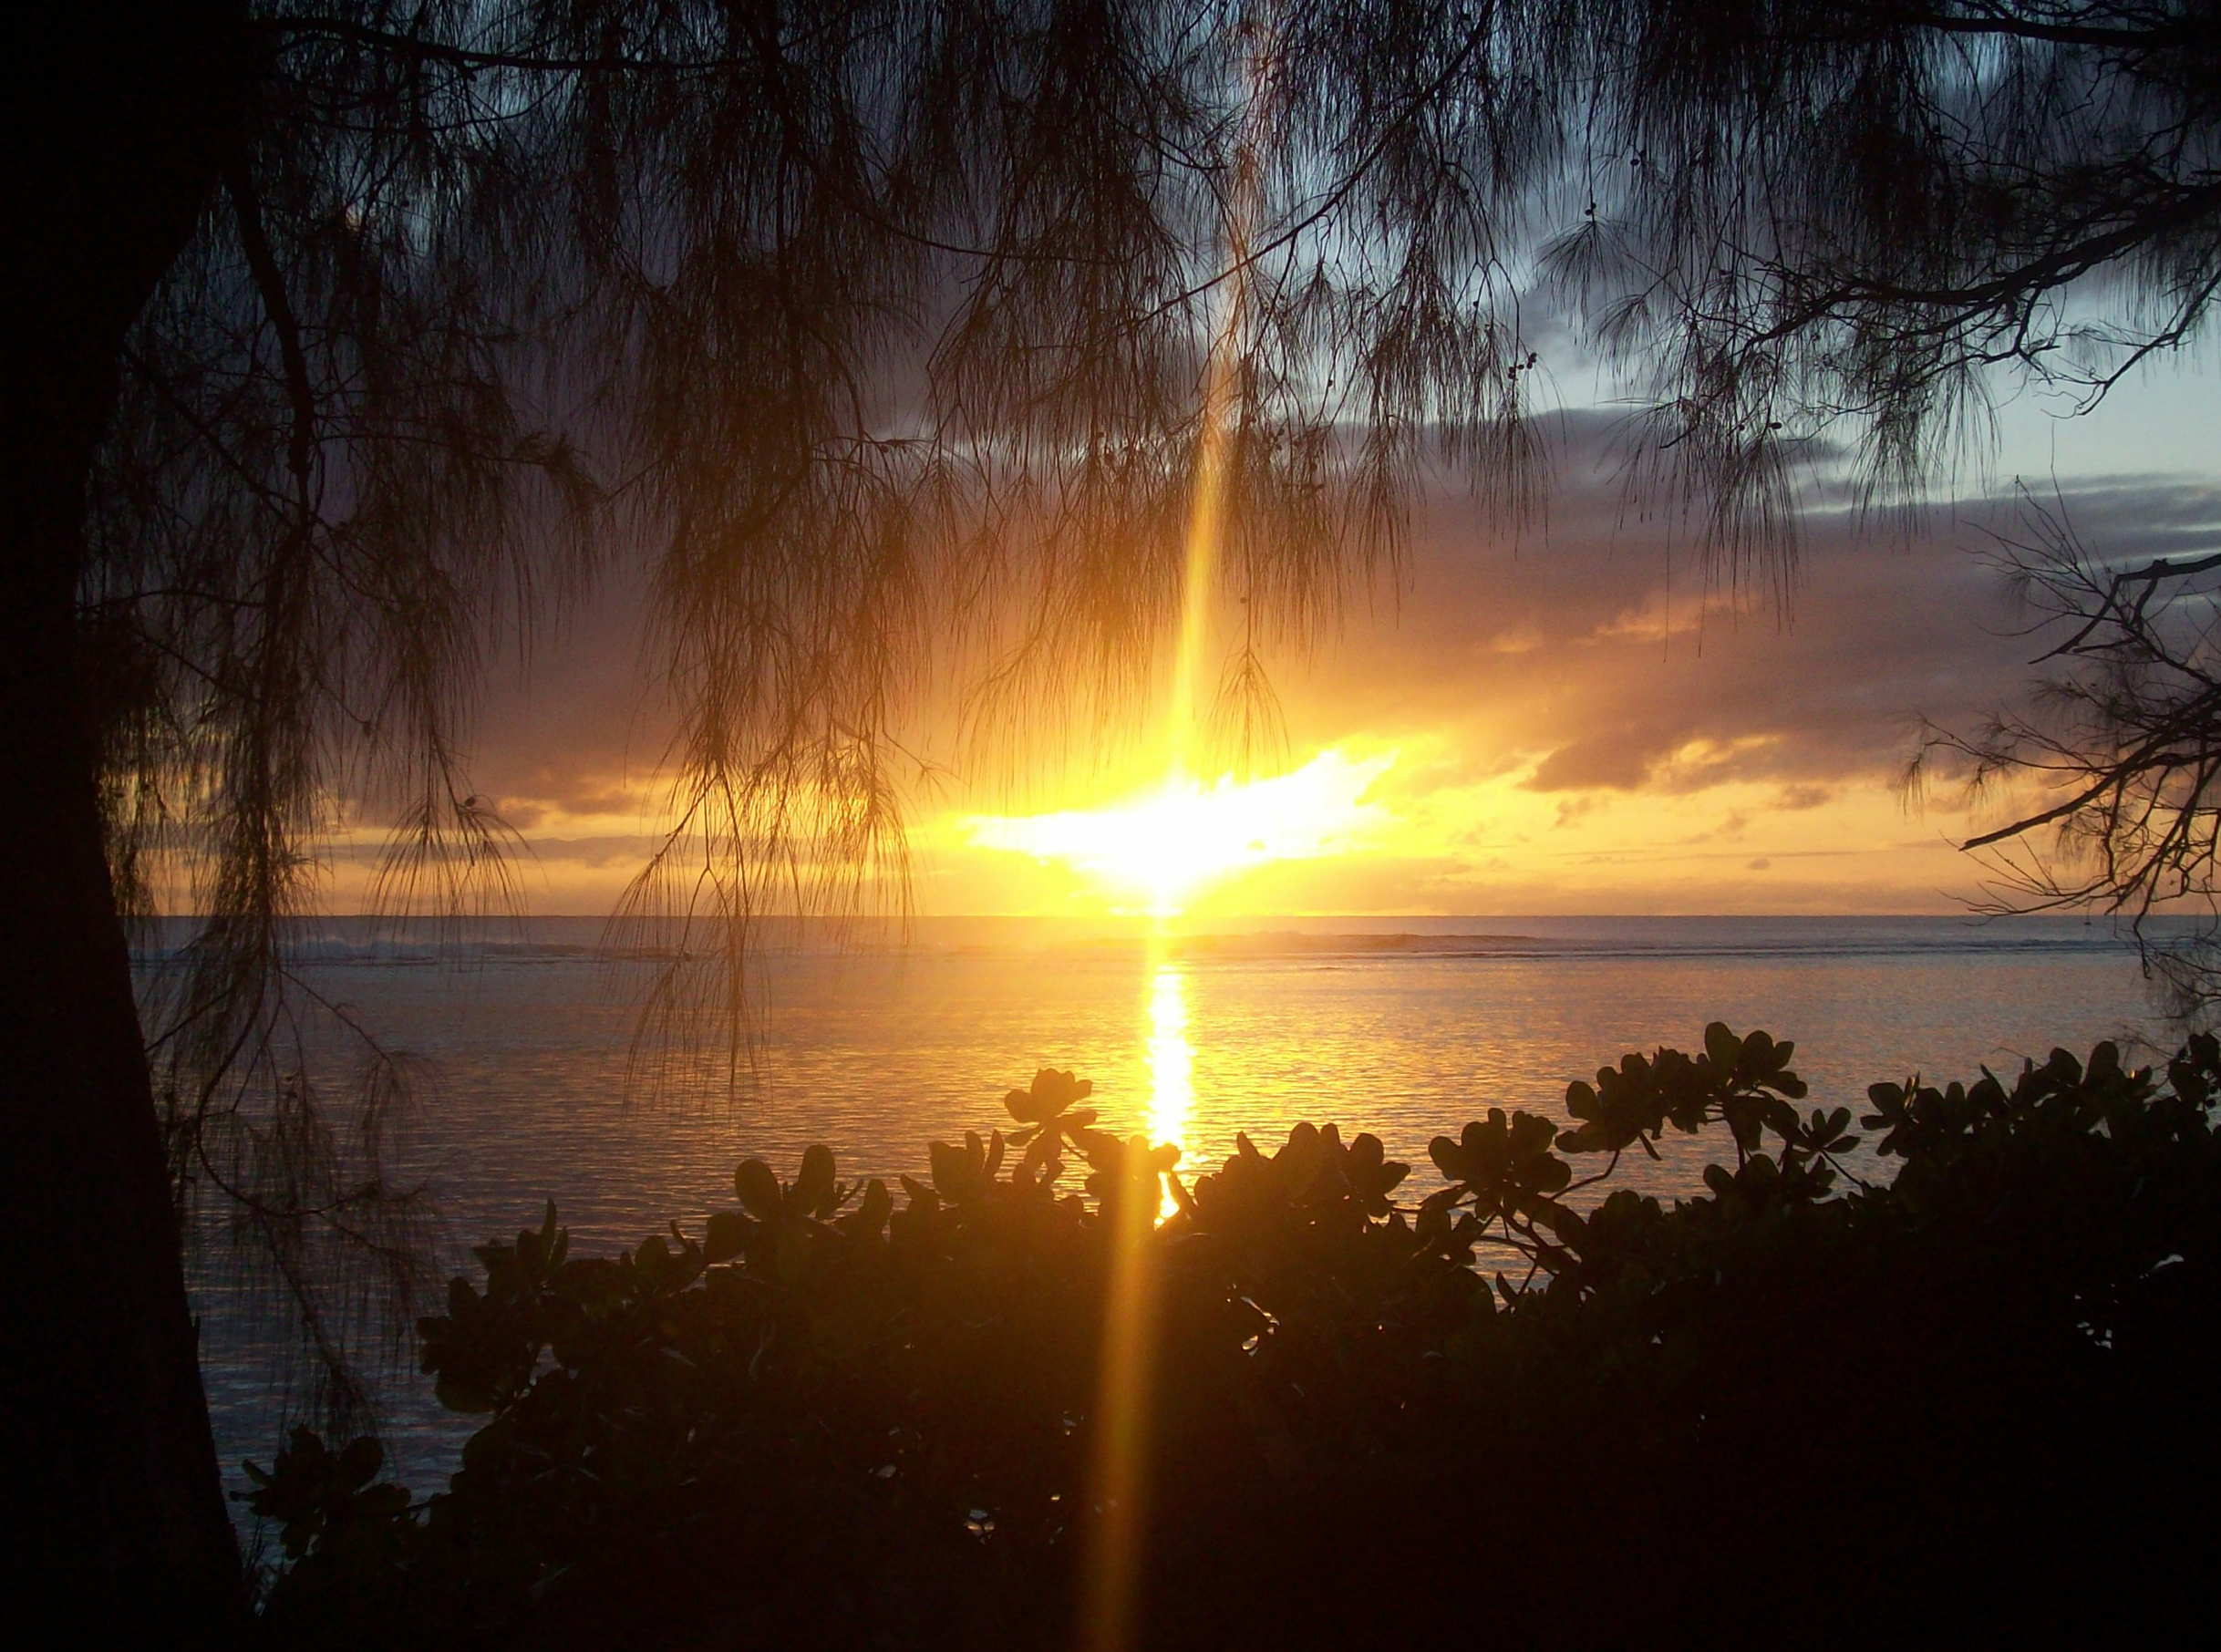 Sunset on Rarotonga, Pacific, Raro, Rarotonga, Scenery, HQ Photo